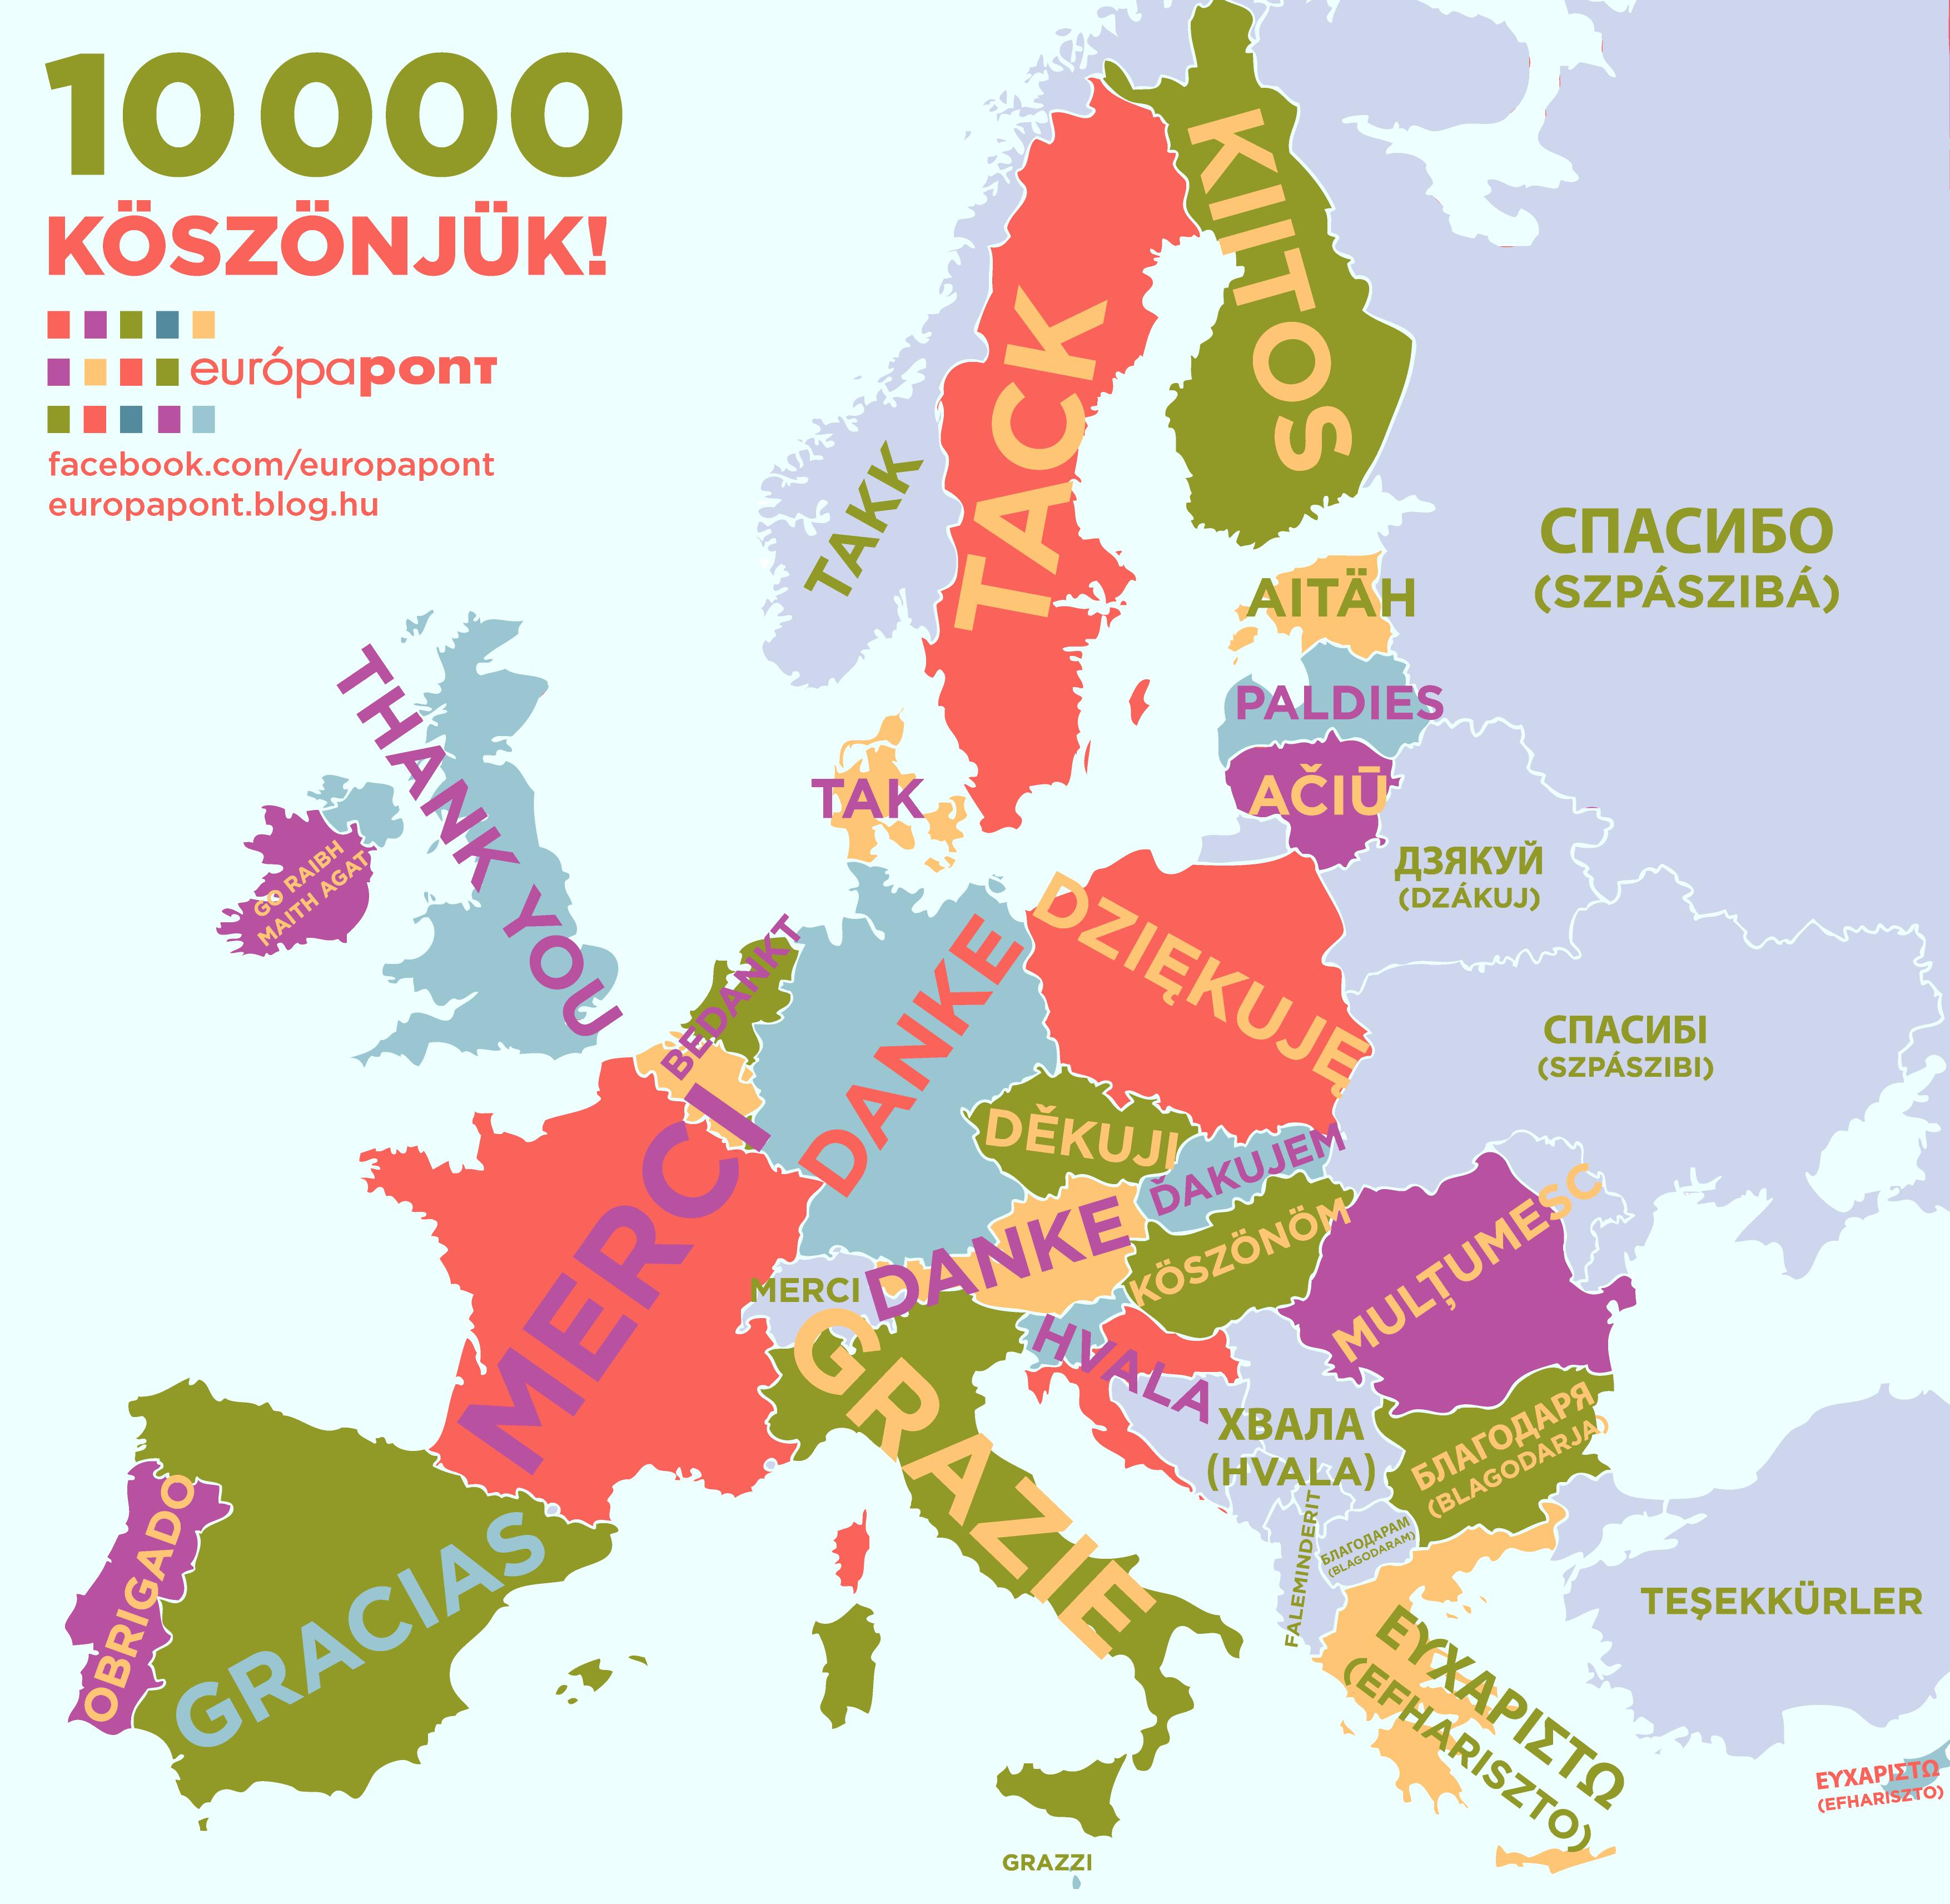 europa_terkep_koszi_10000_full-01.png